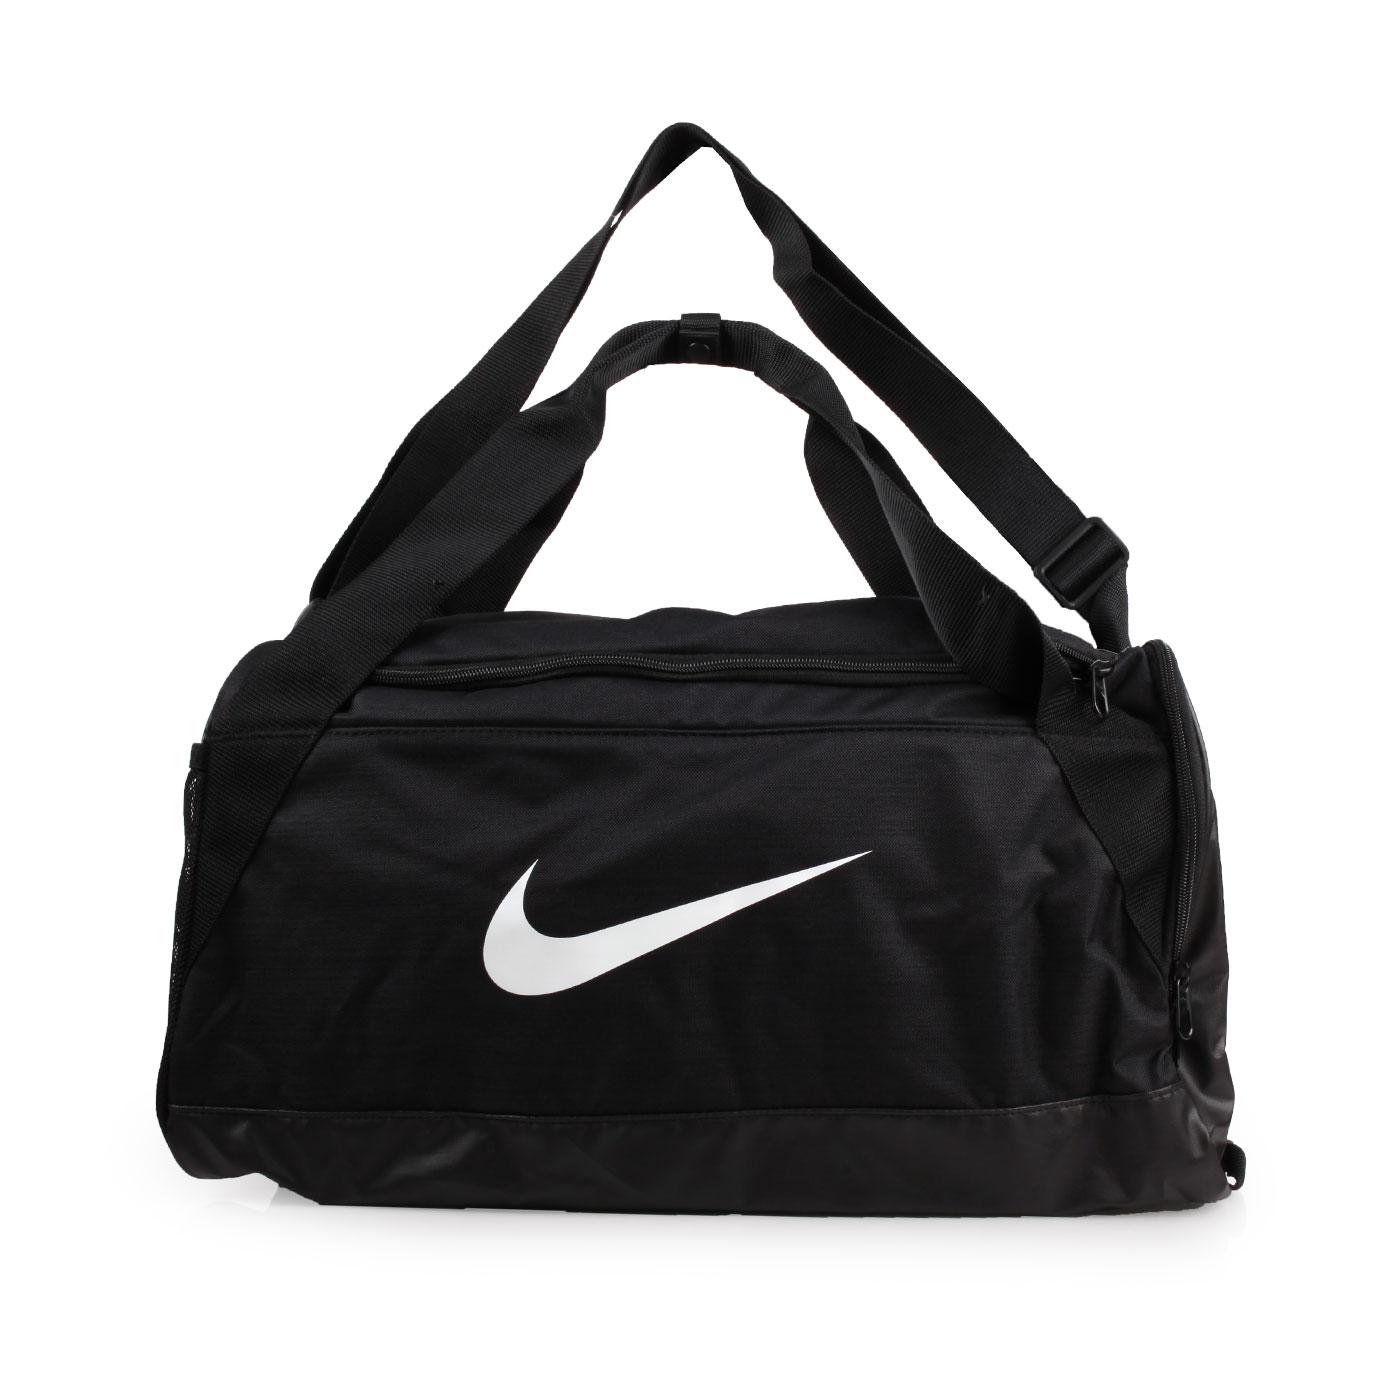 NIKE 訓練包 (旅行包 側背包 健身包 單肩包 手提袋【05481453】≡排汗專家≡